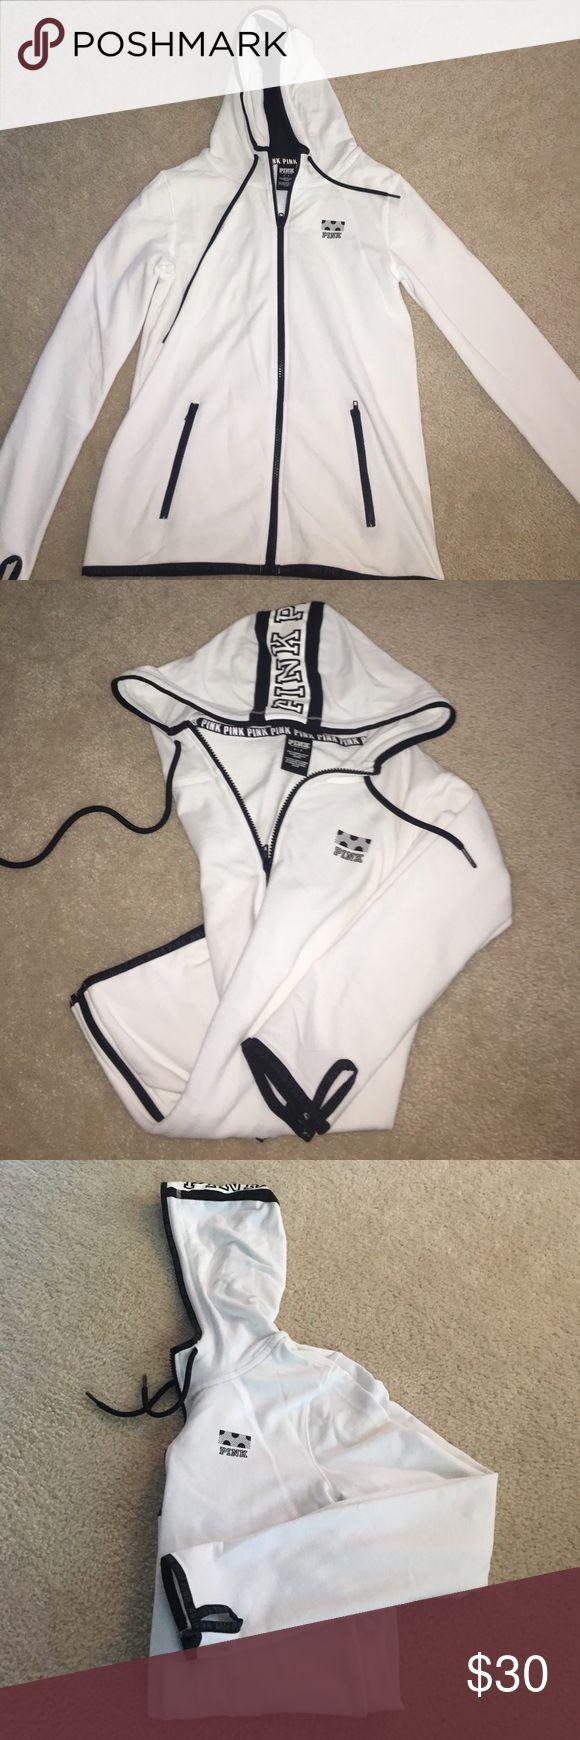 PiNK Victoria Secret White Zip up Hoodie SMALL Practically brand new!! NEVER BEEN WORN!!   Super soft!! Black and white Design PINK Victoria's Secret Tops Sweatshirts & Hoodies